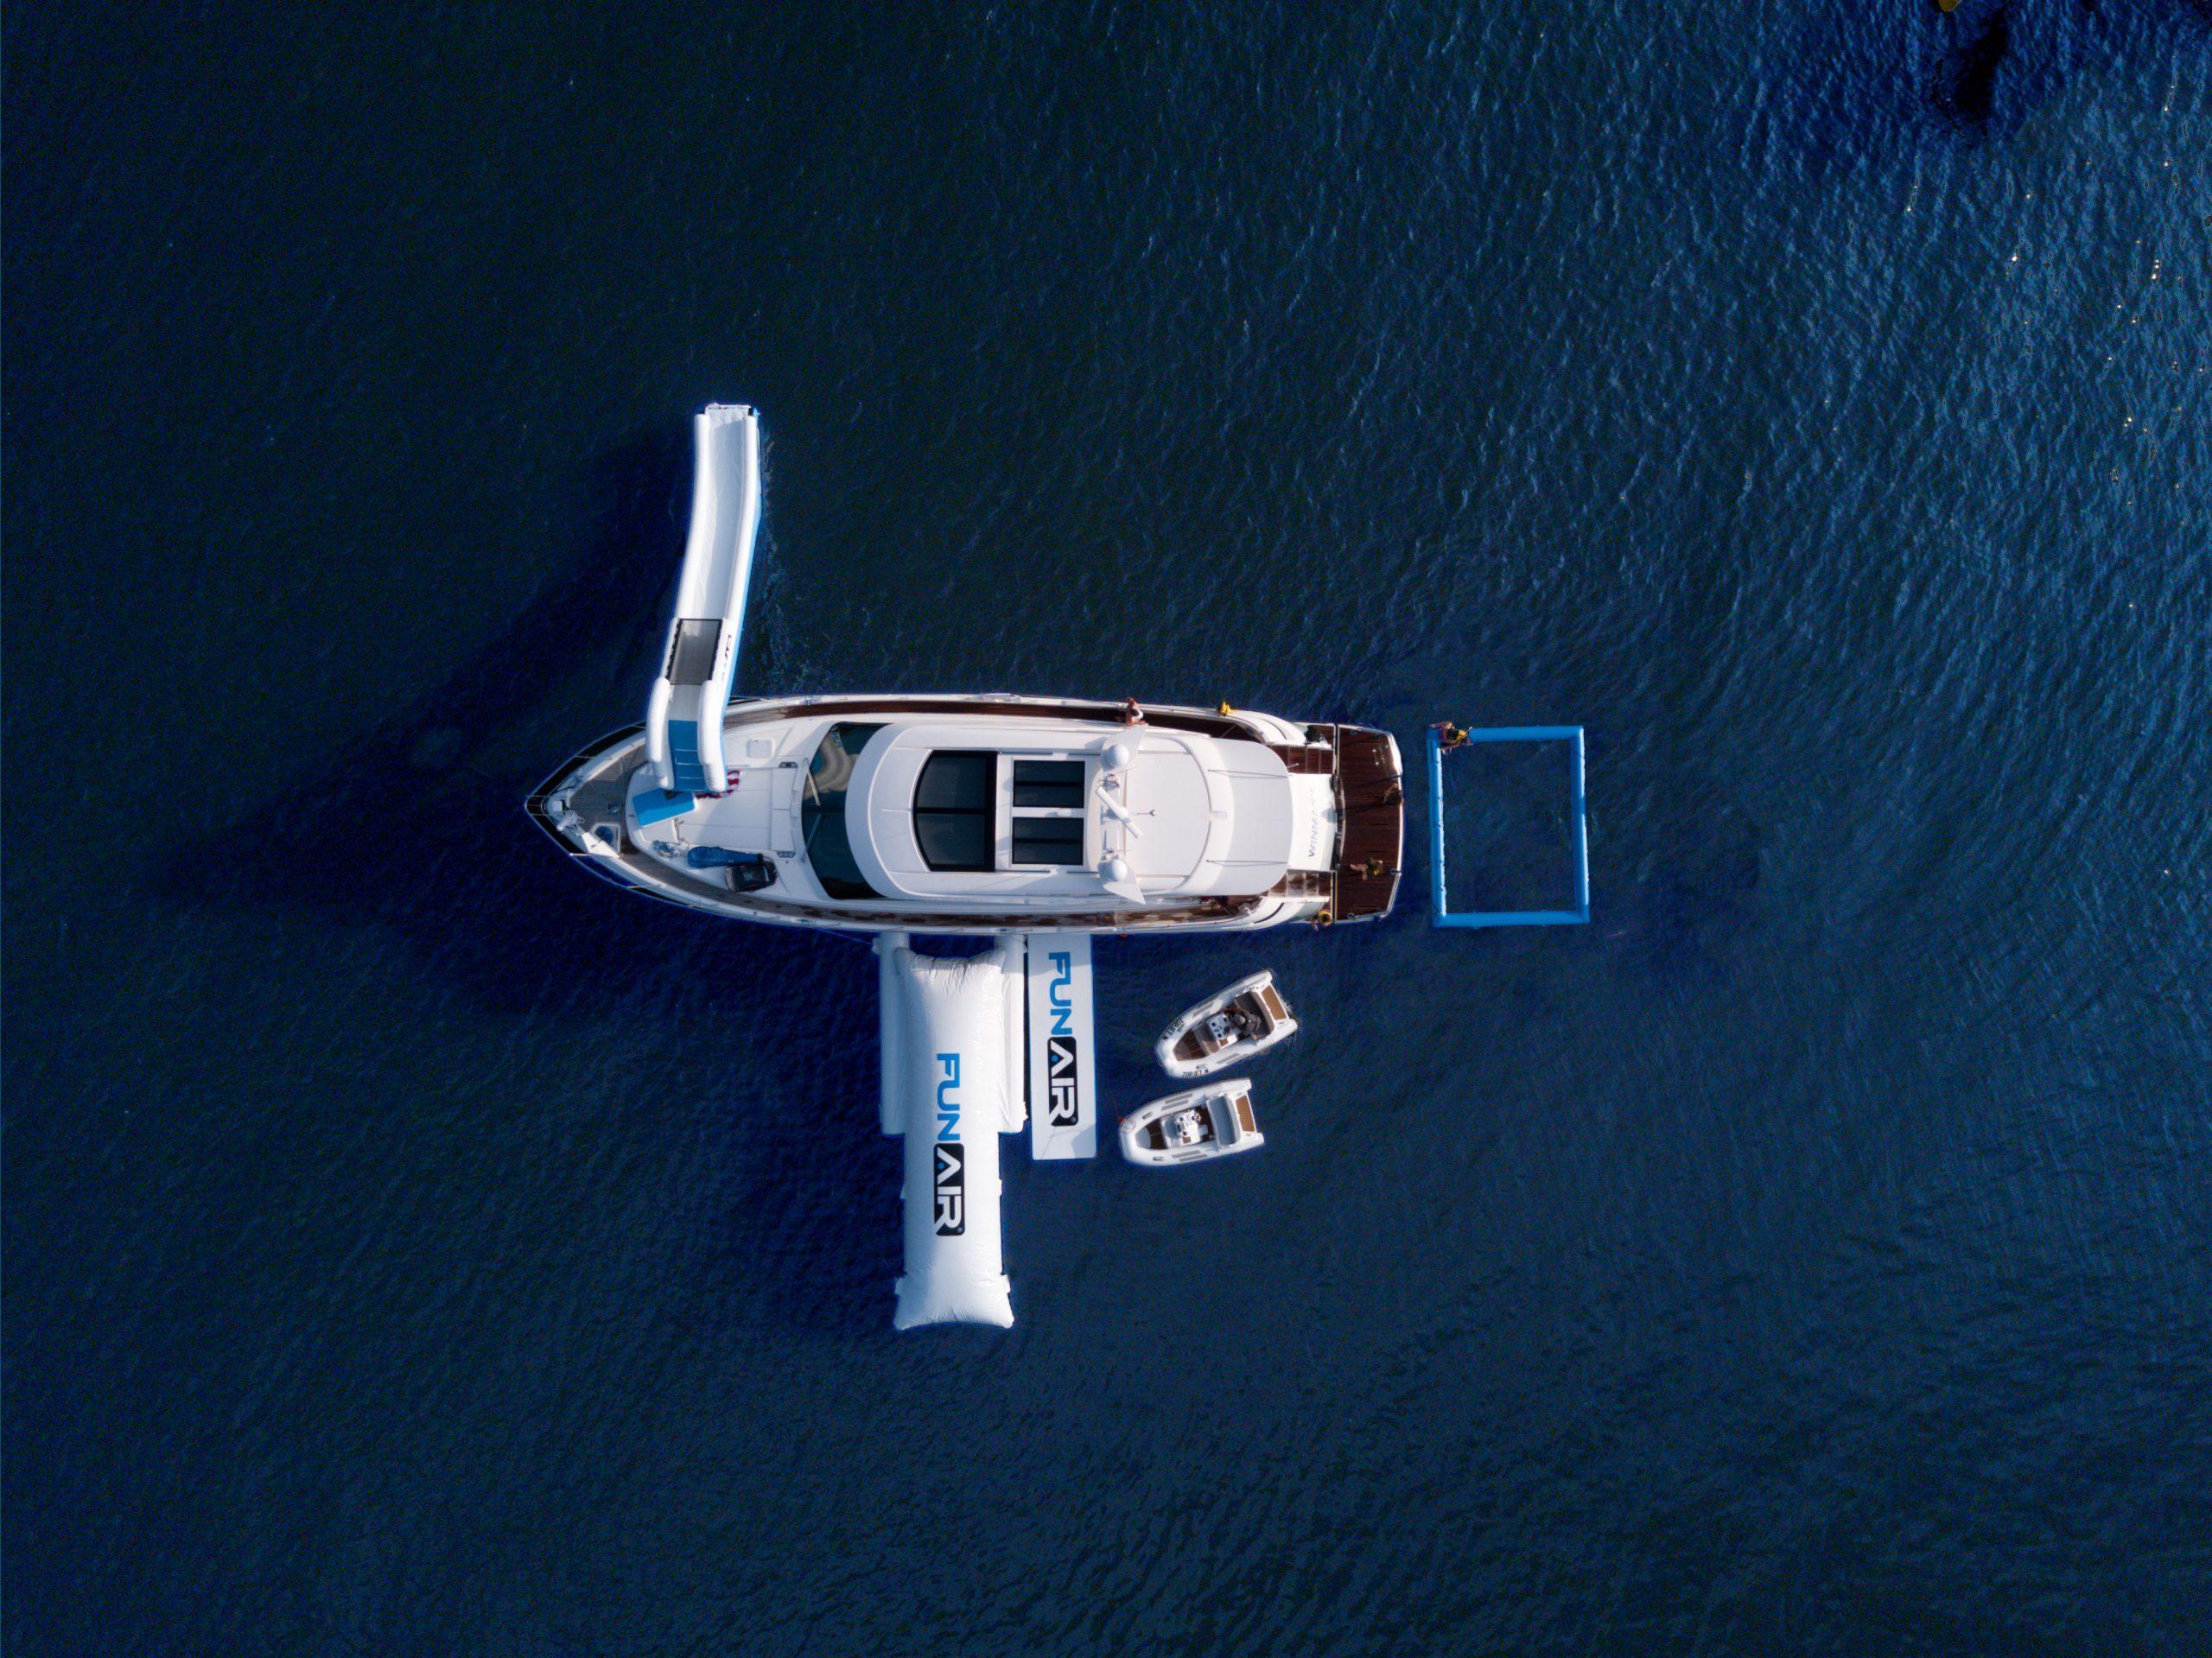 FunAir Marine Riley Aussie Lagoon Pool BigAir Blob and Yacht slide